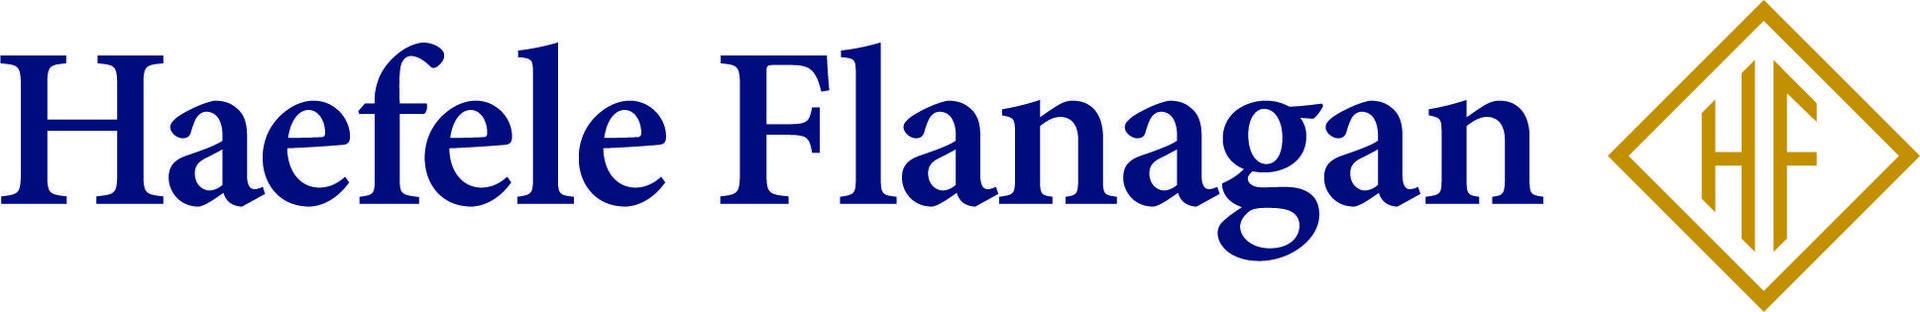 Haefele Flanagan